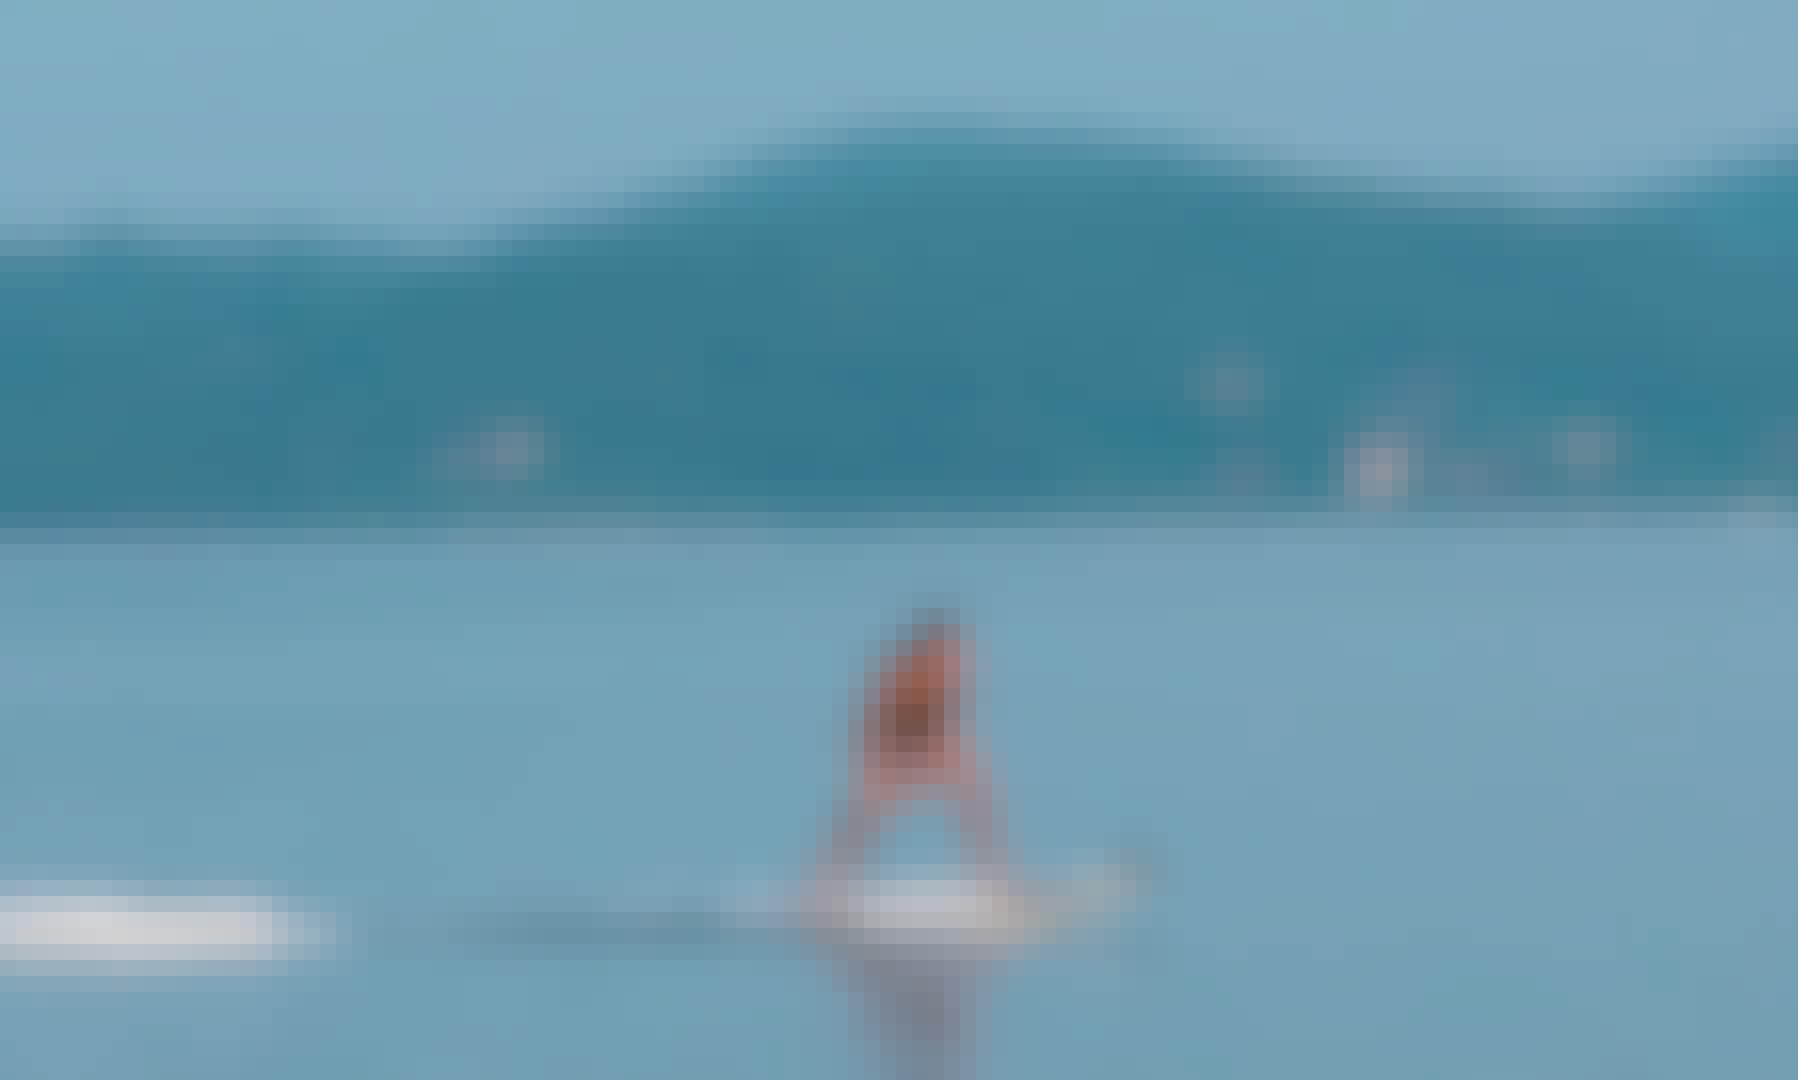 Electric Surfboard for Rent in Split, Croatia (SURFER_hr by Poletusa)